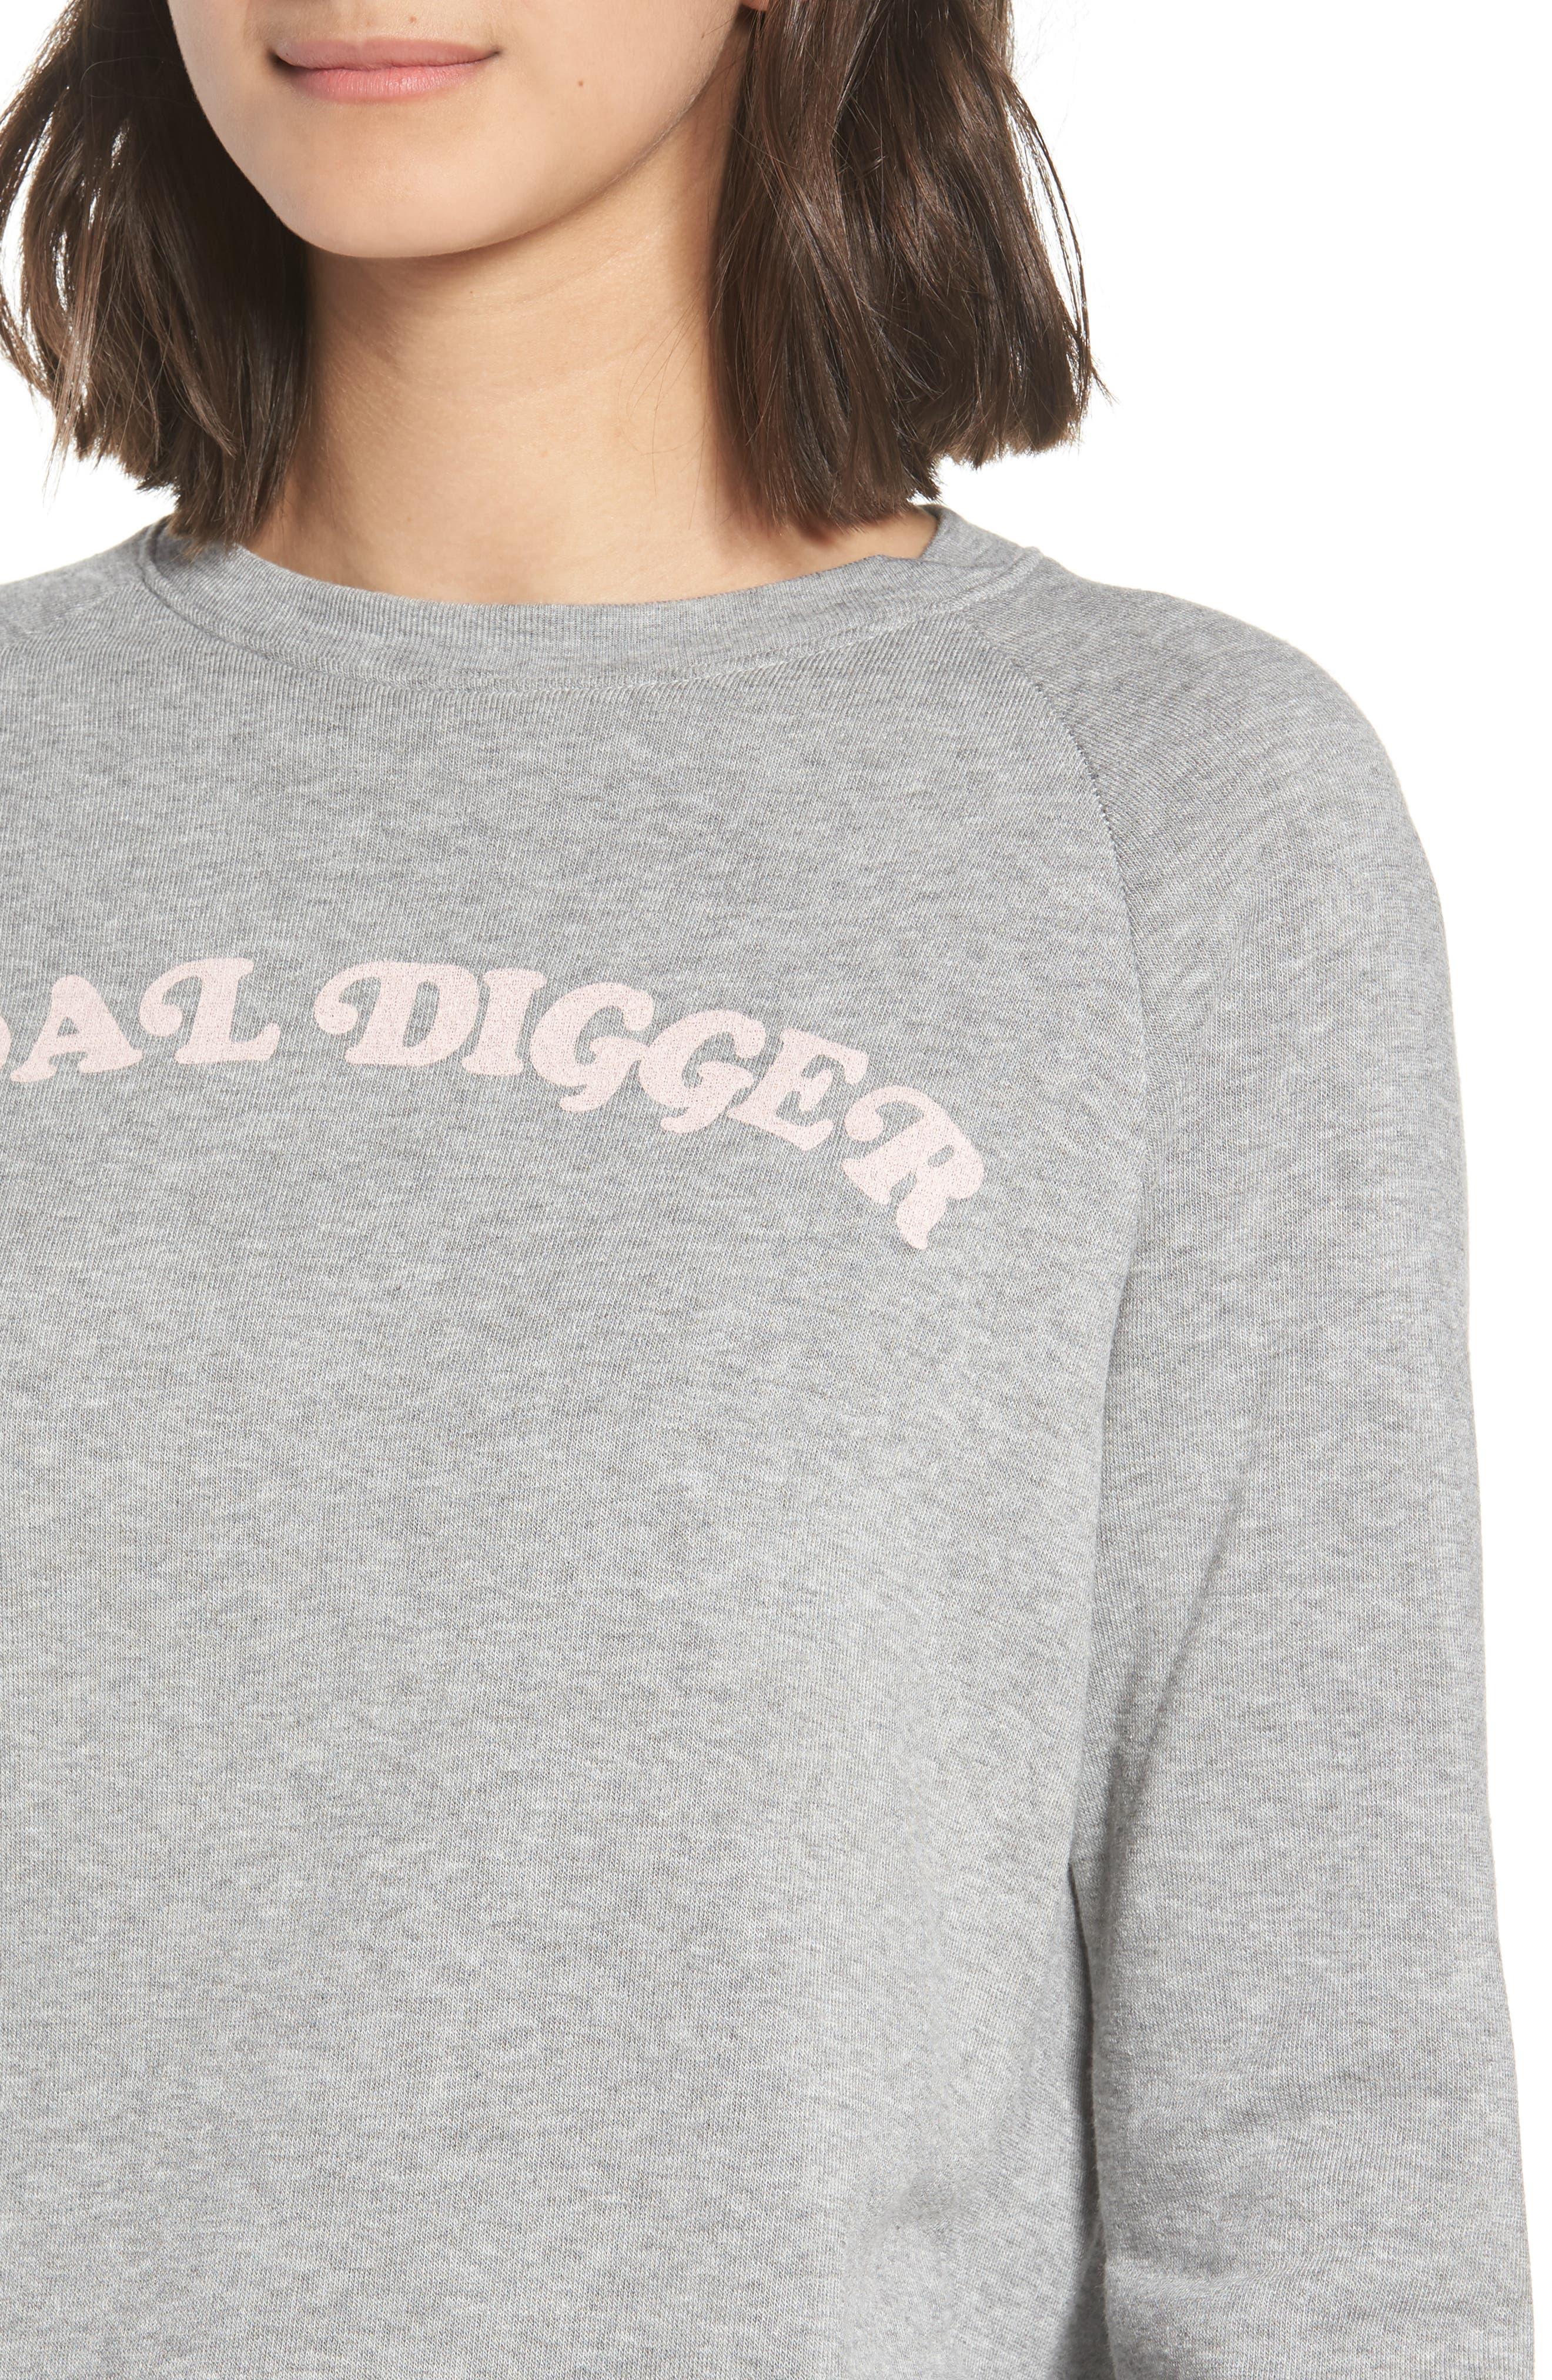 Goal Digger Sweatshirt,                             Alternate thumbnail 4, color,                             020